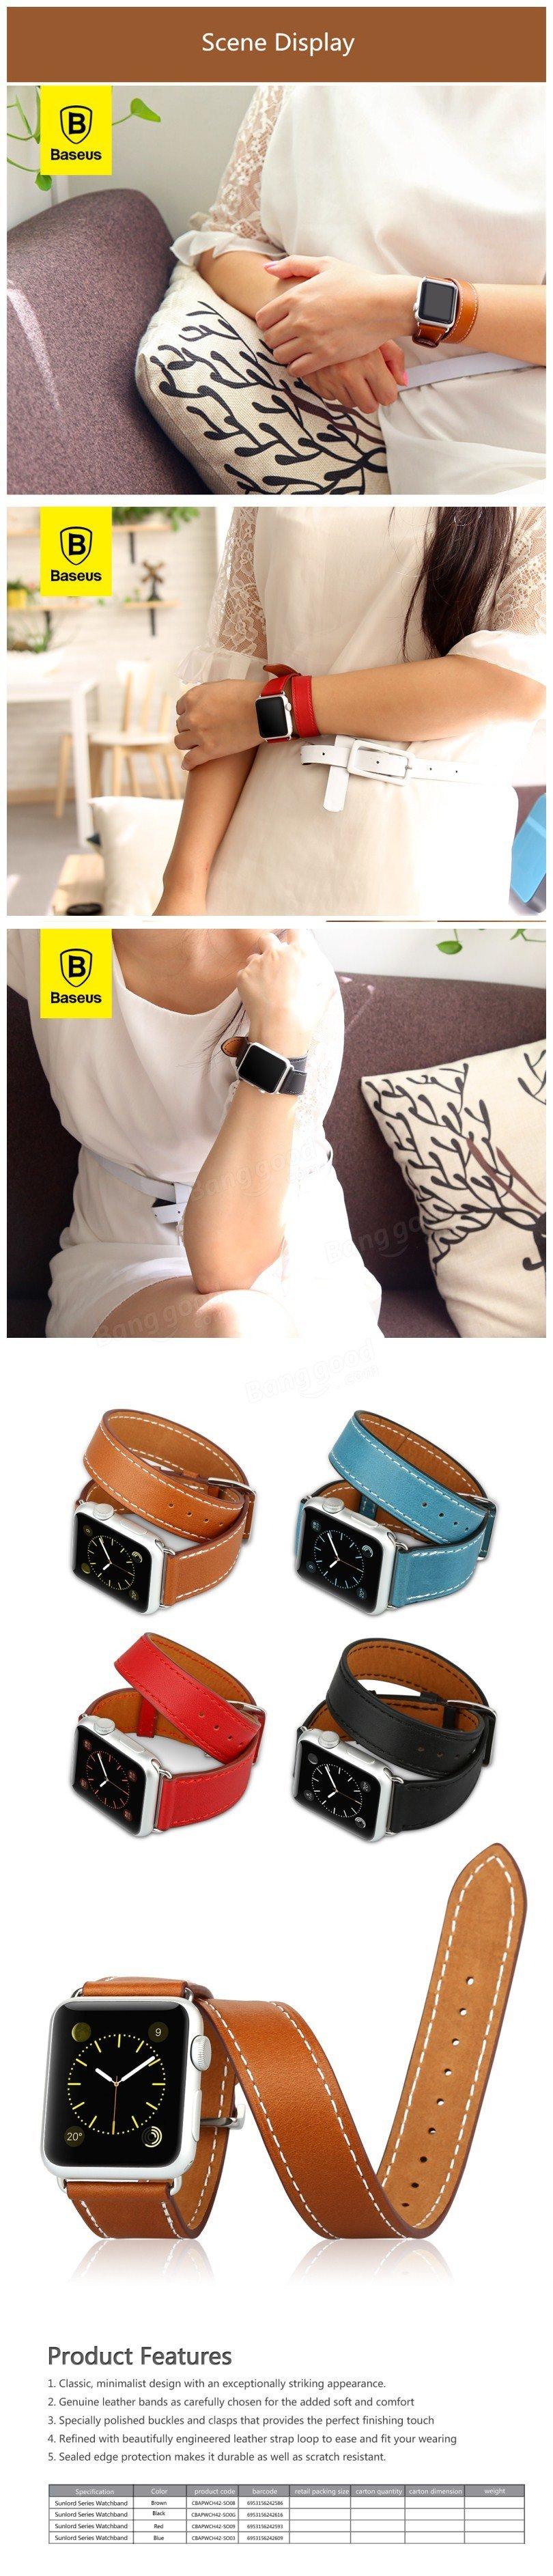 baseus sunlord series genuine leather watchband wrist band strap